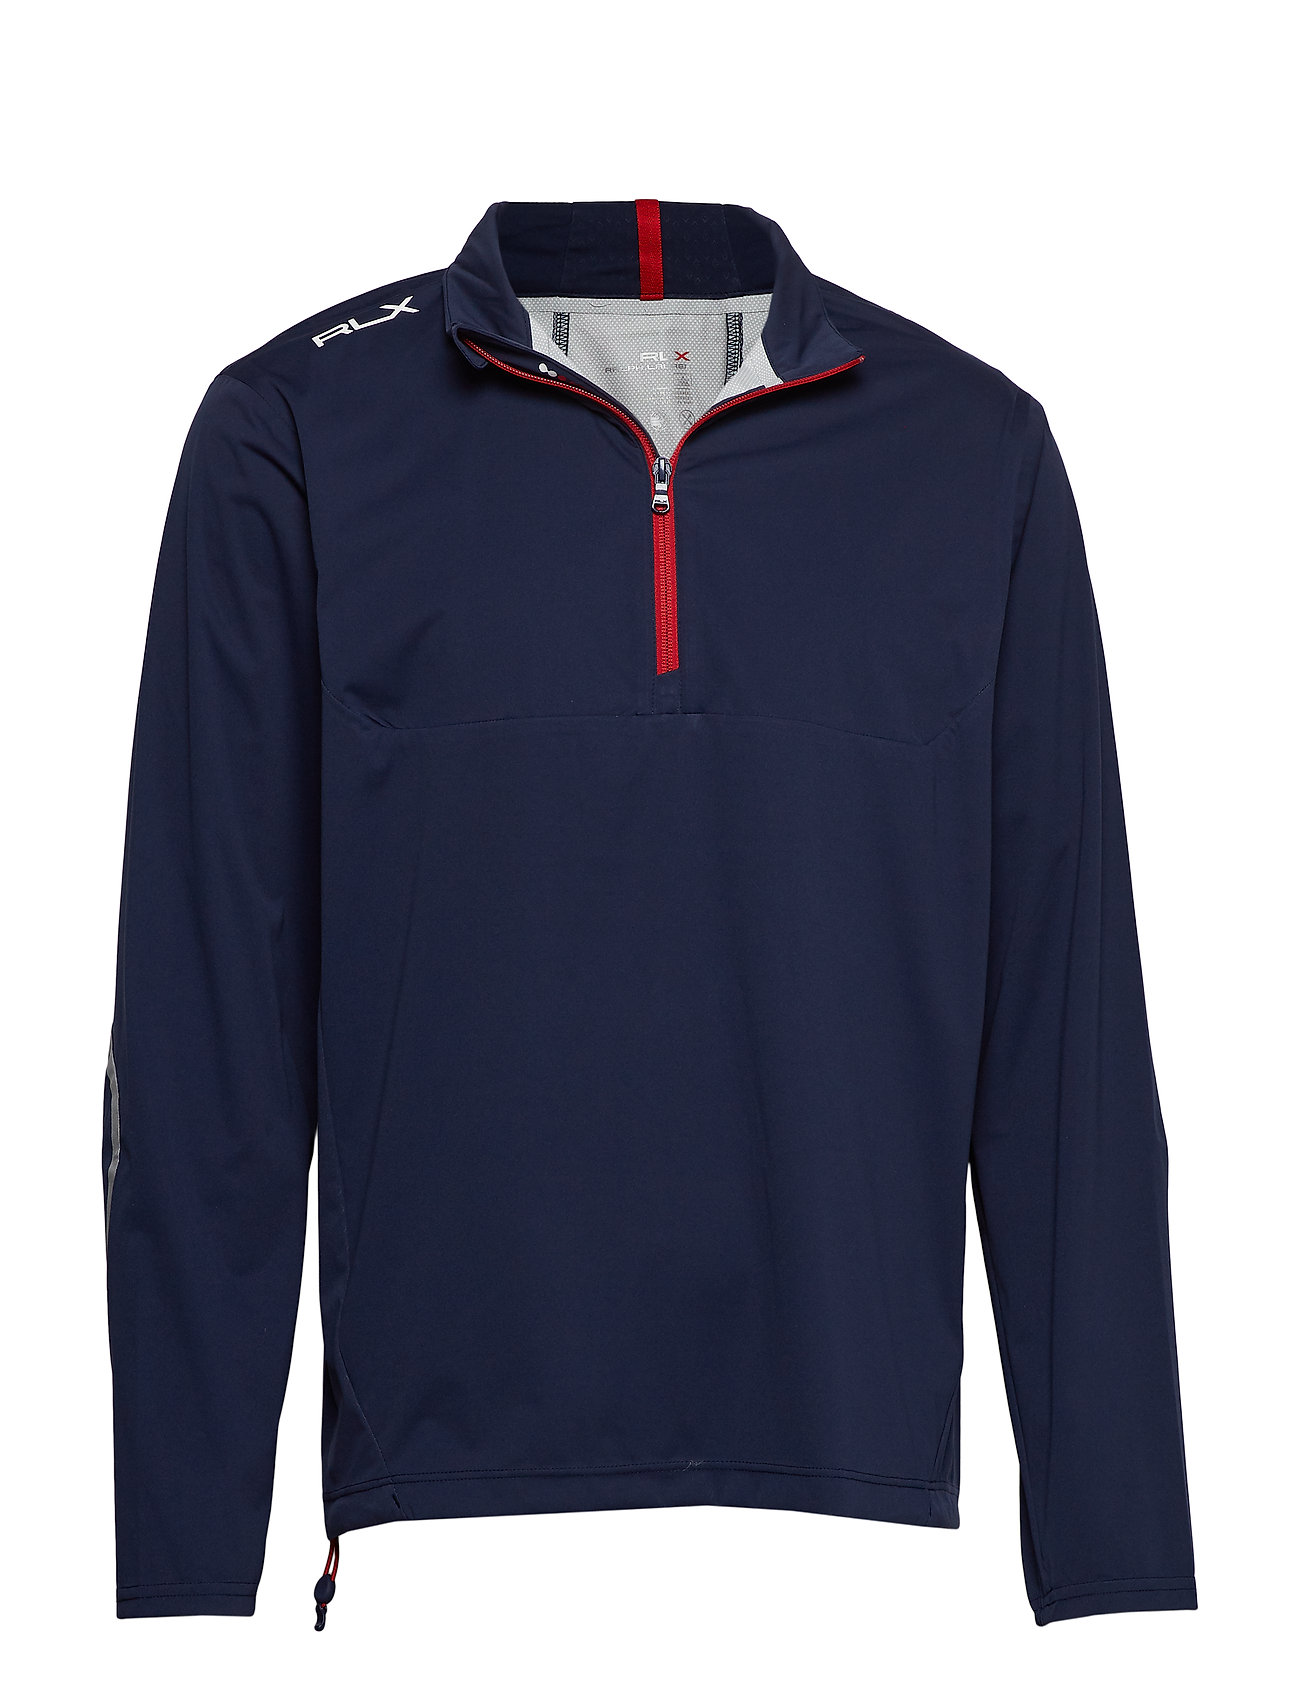 Ralph Lauren Golf Paneled Interlock Golf Jacket - FRENCH NAVY